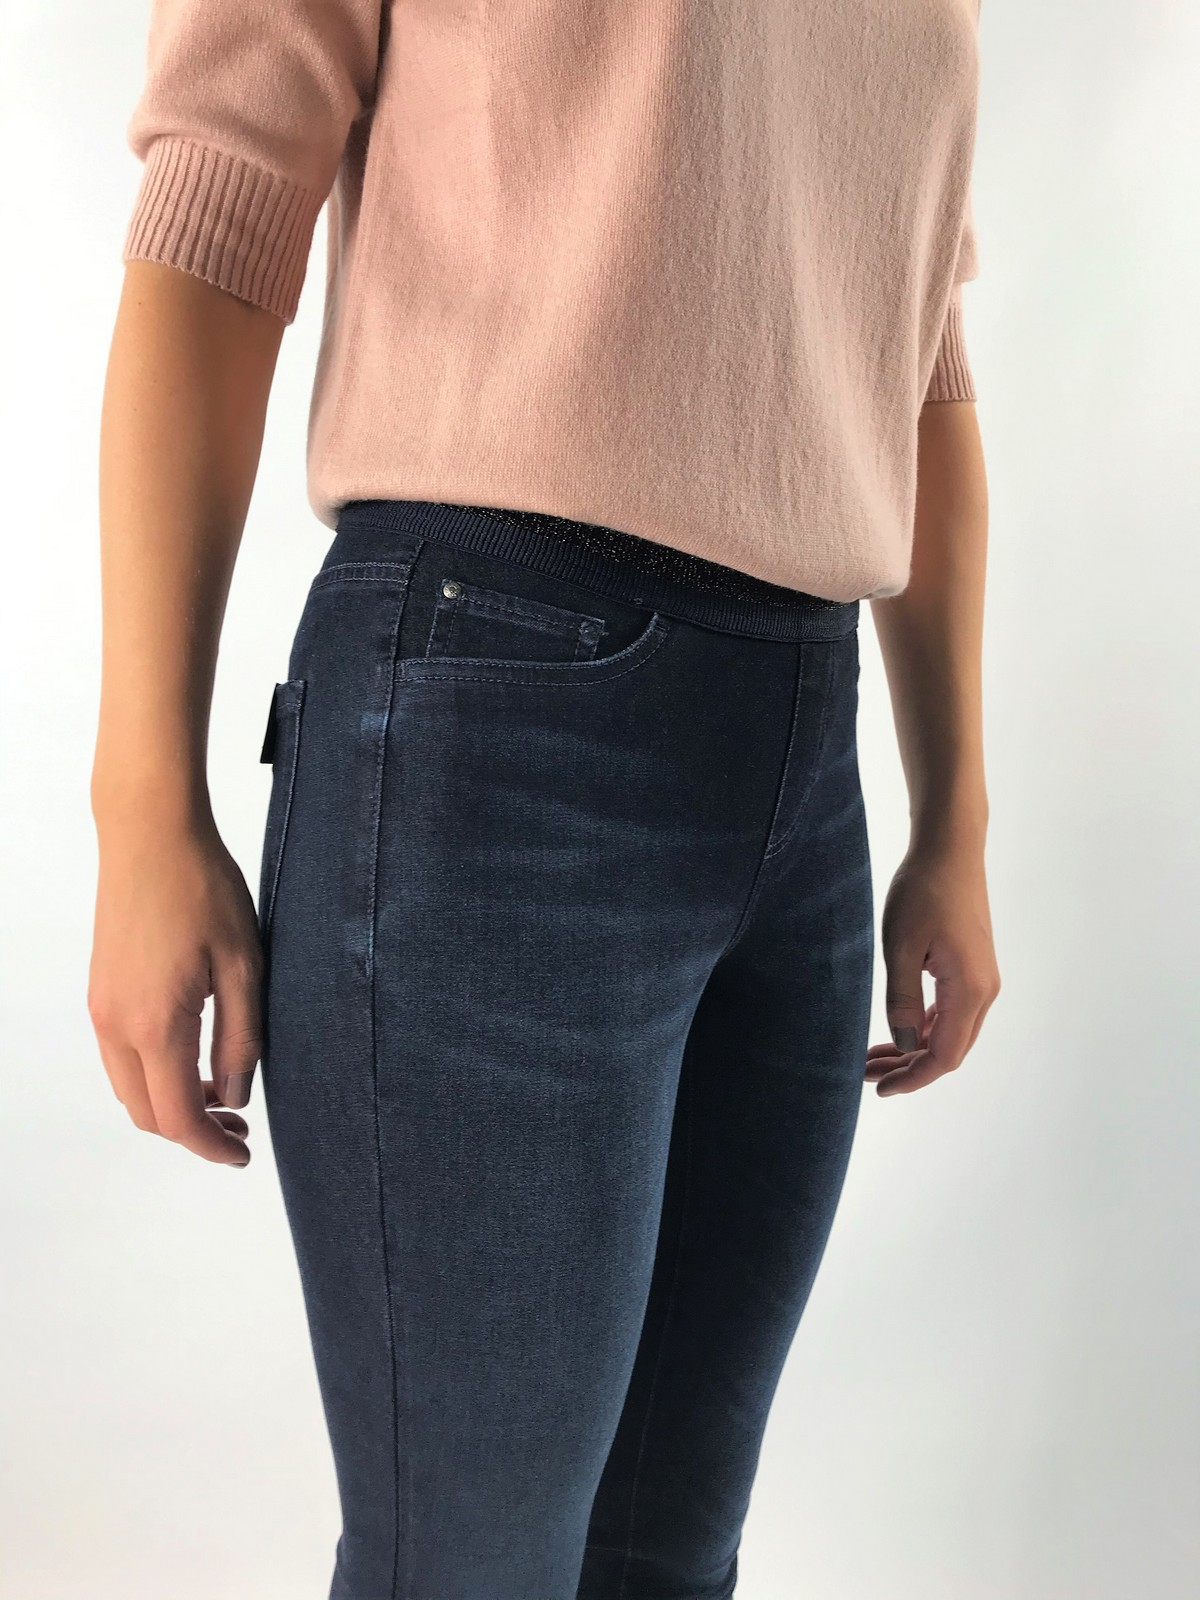 Cambio - Philia 9125 - jeans smal op elastiek